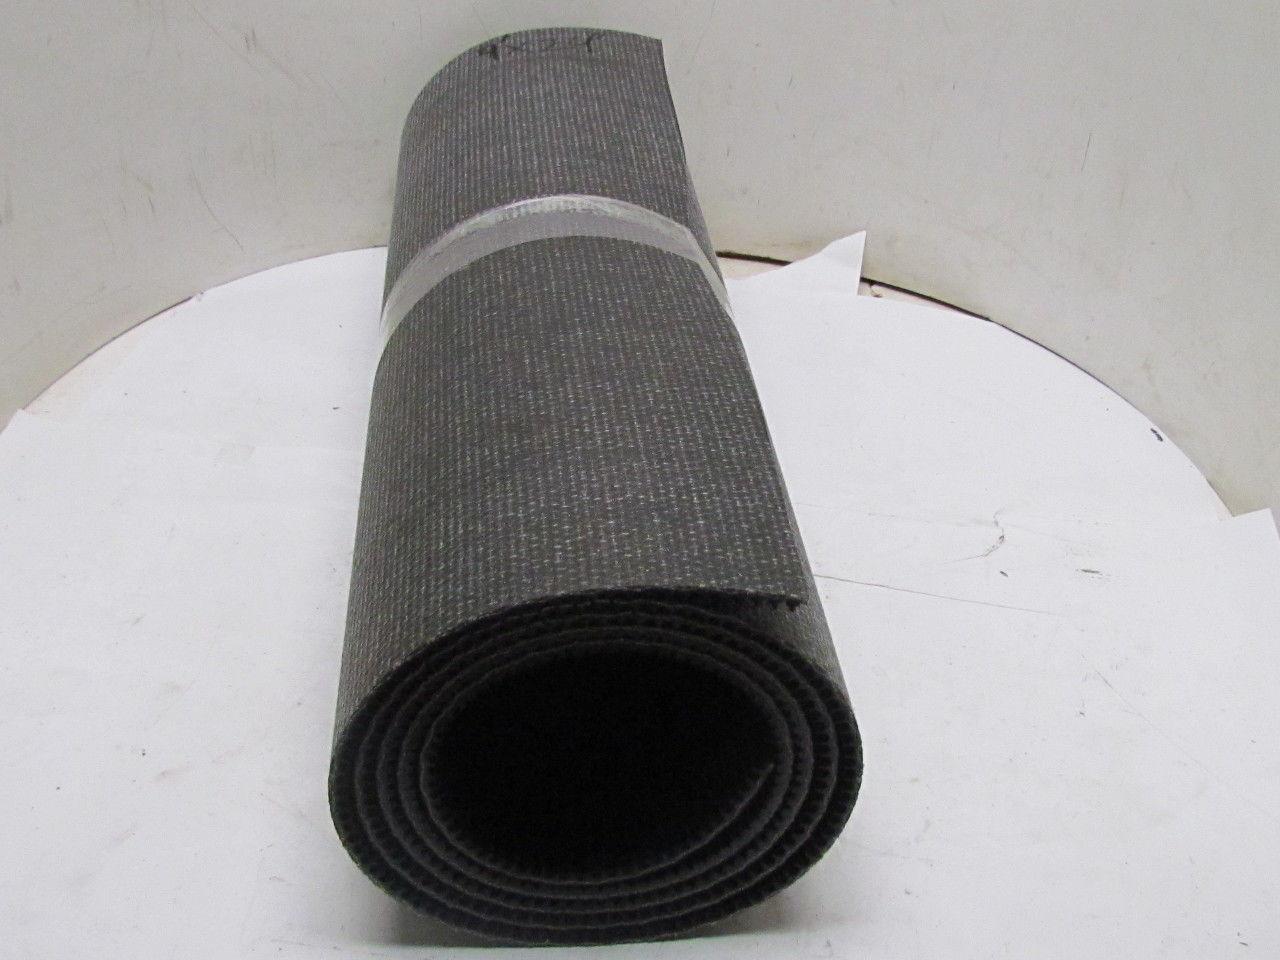 1 Ply Rough Top Material Handling Incline Conveyor Belt